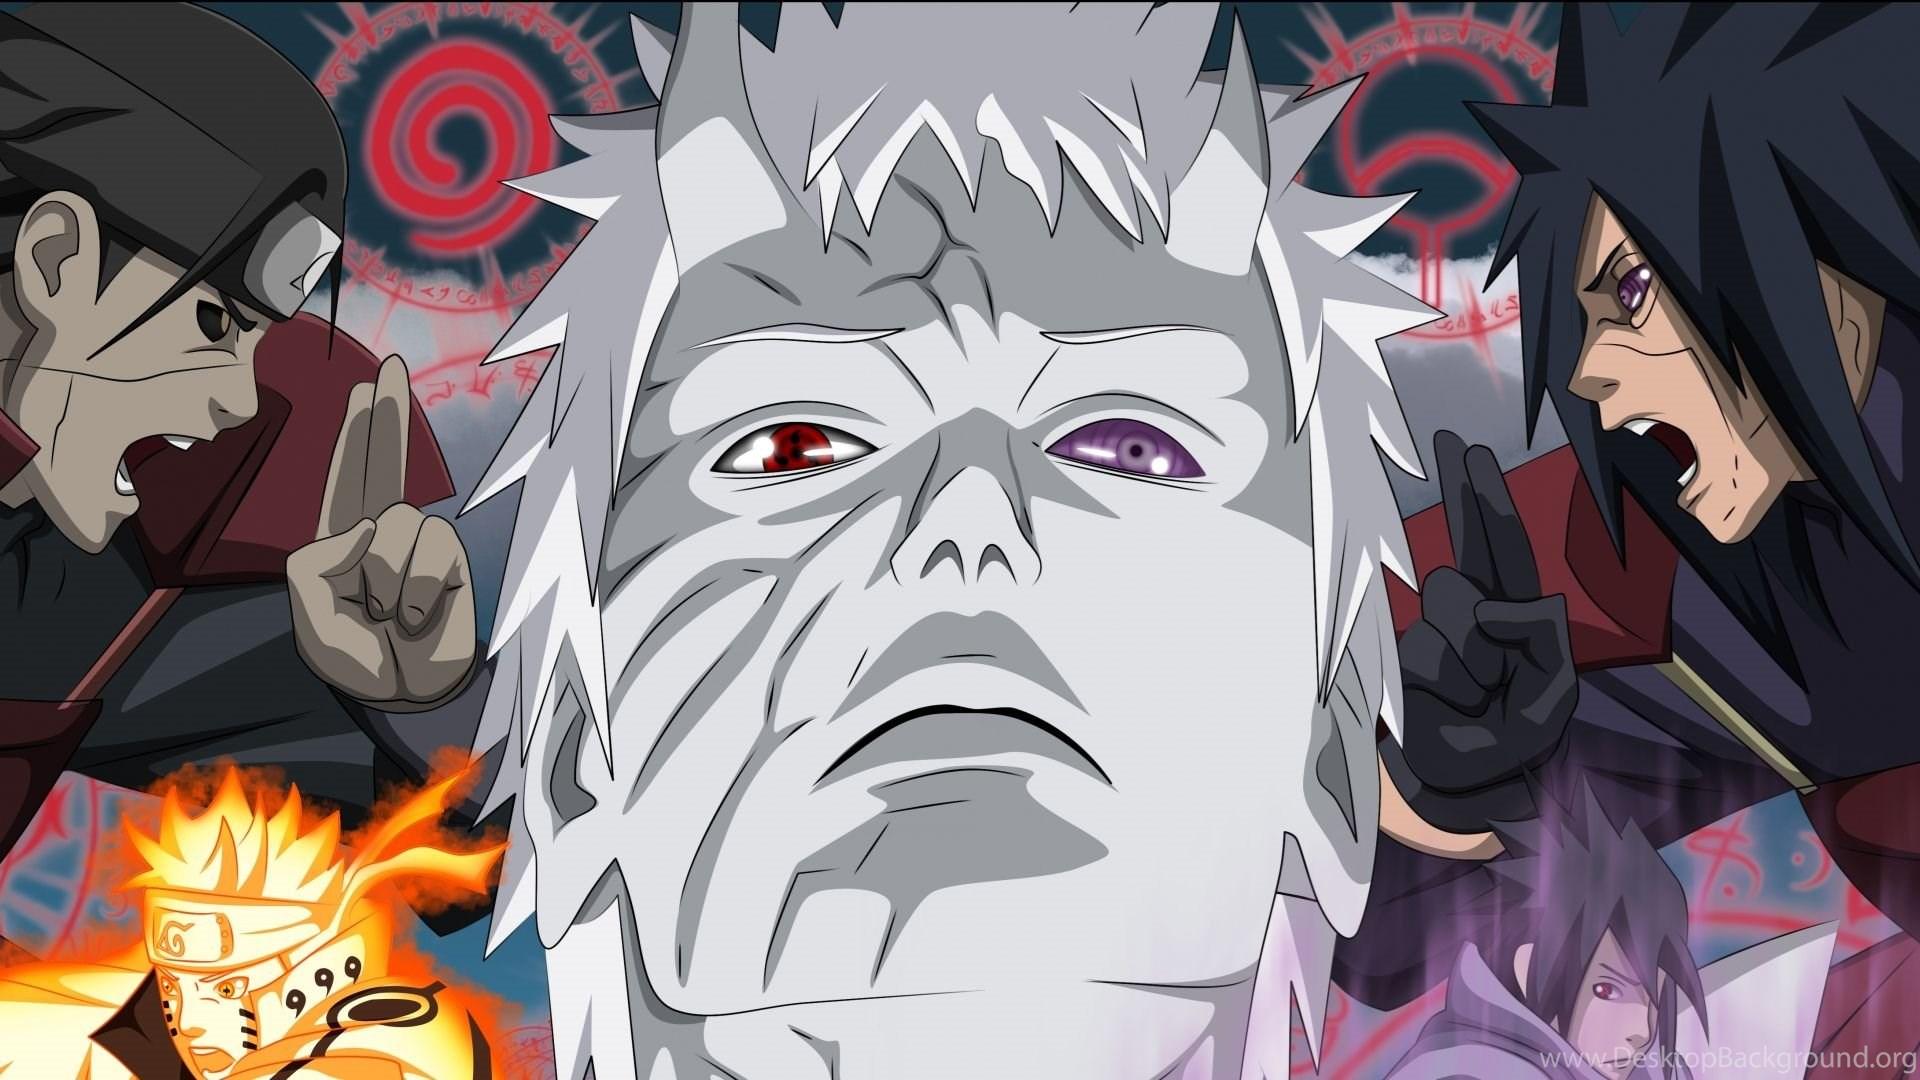 2560x1080 21 9 Tv Anime Wallpapers Desktop Backgrounds Hd